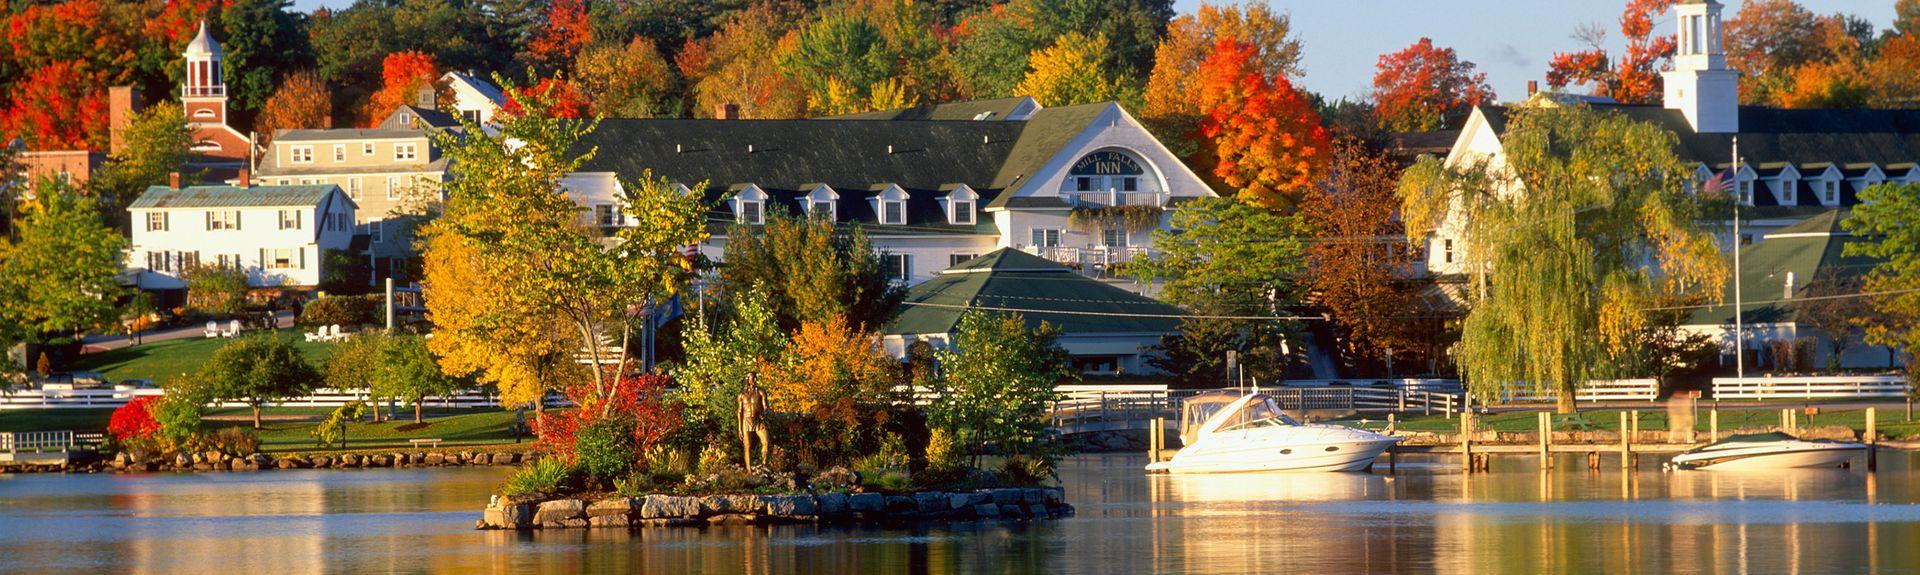 Meredith, New Hampshire, United States